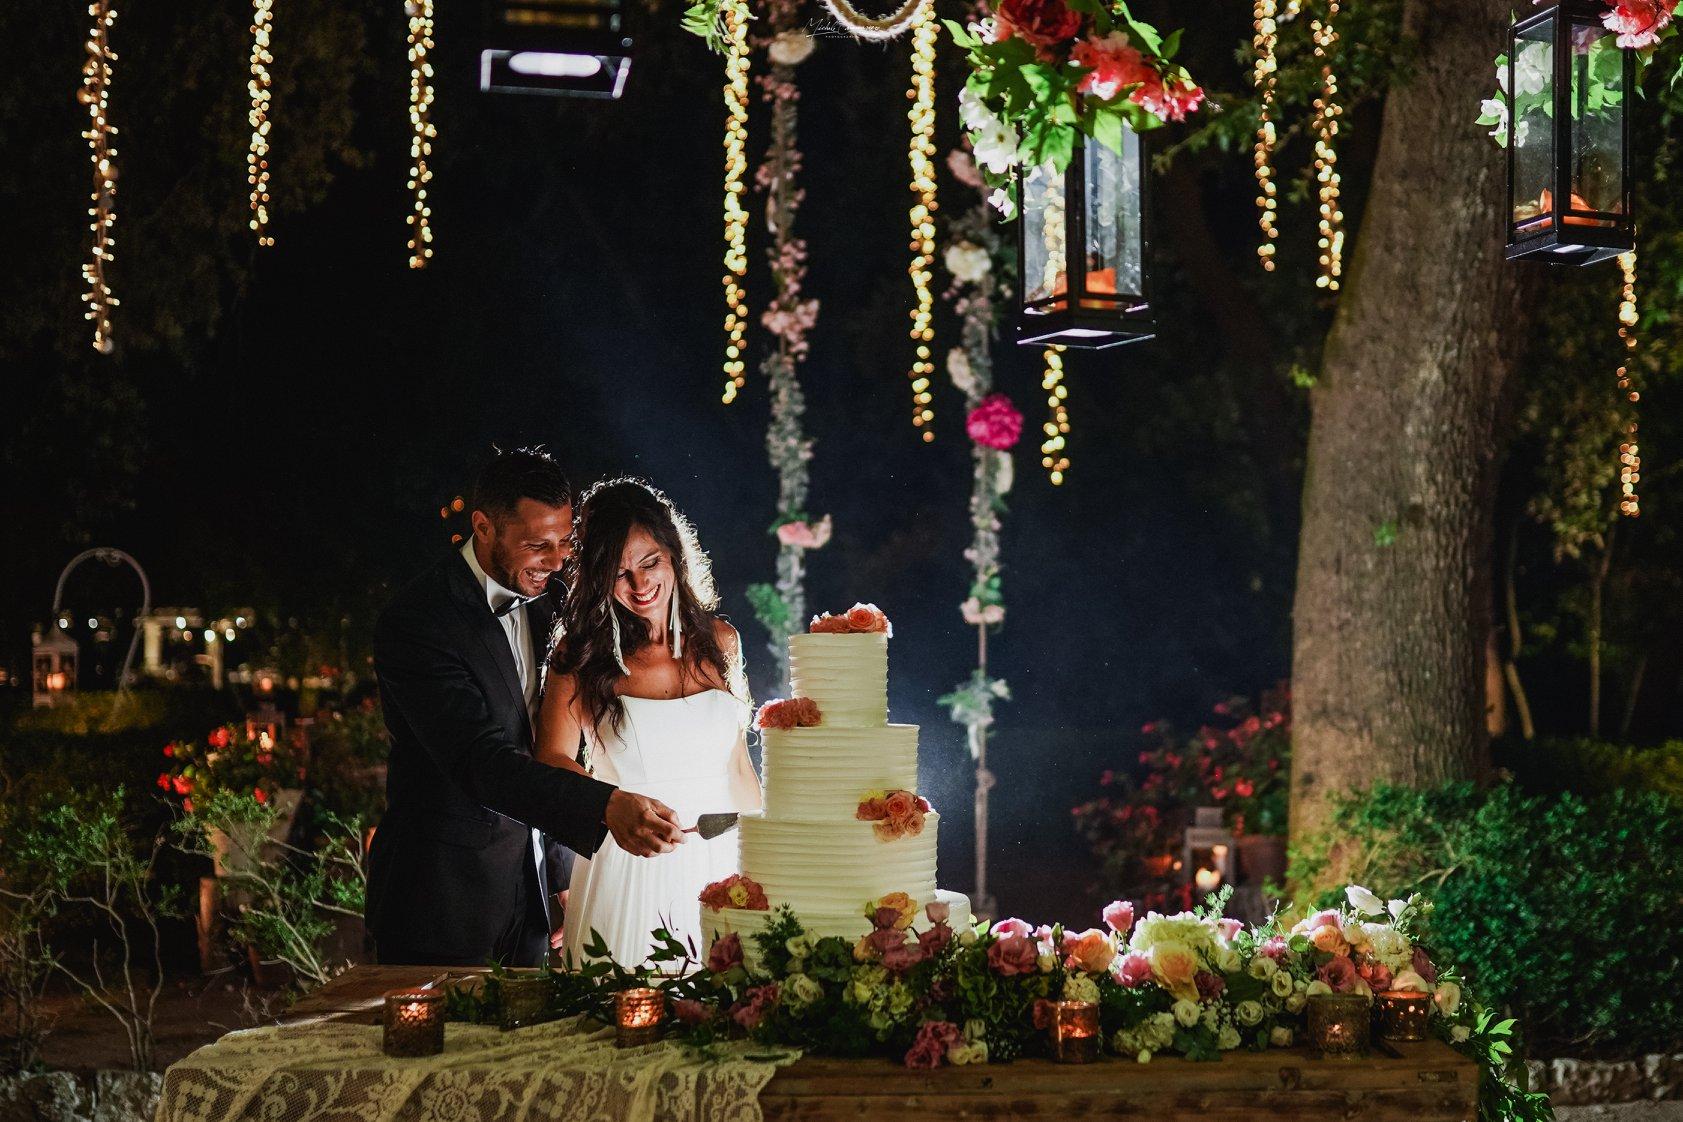 Magical wedding location Puglia